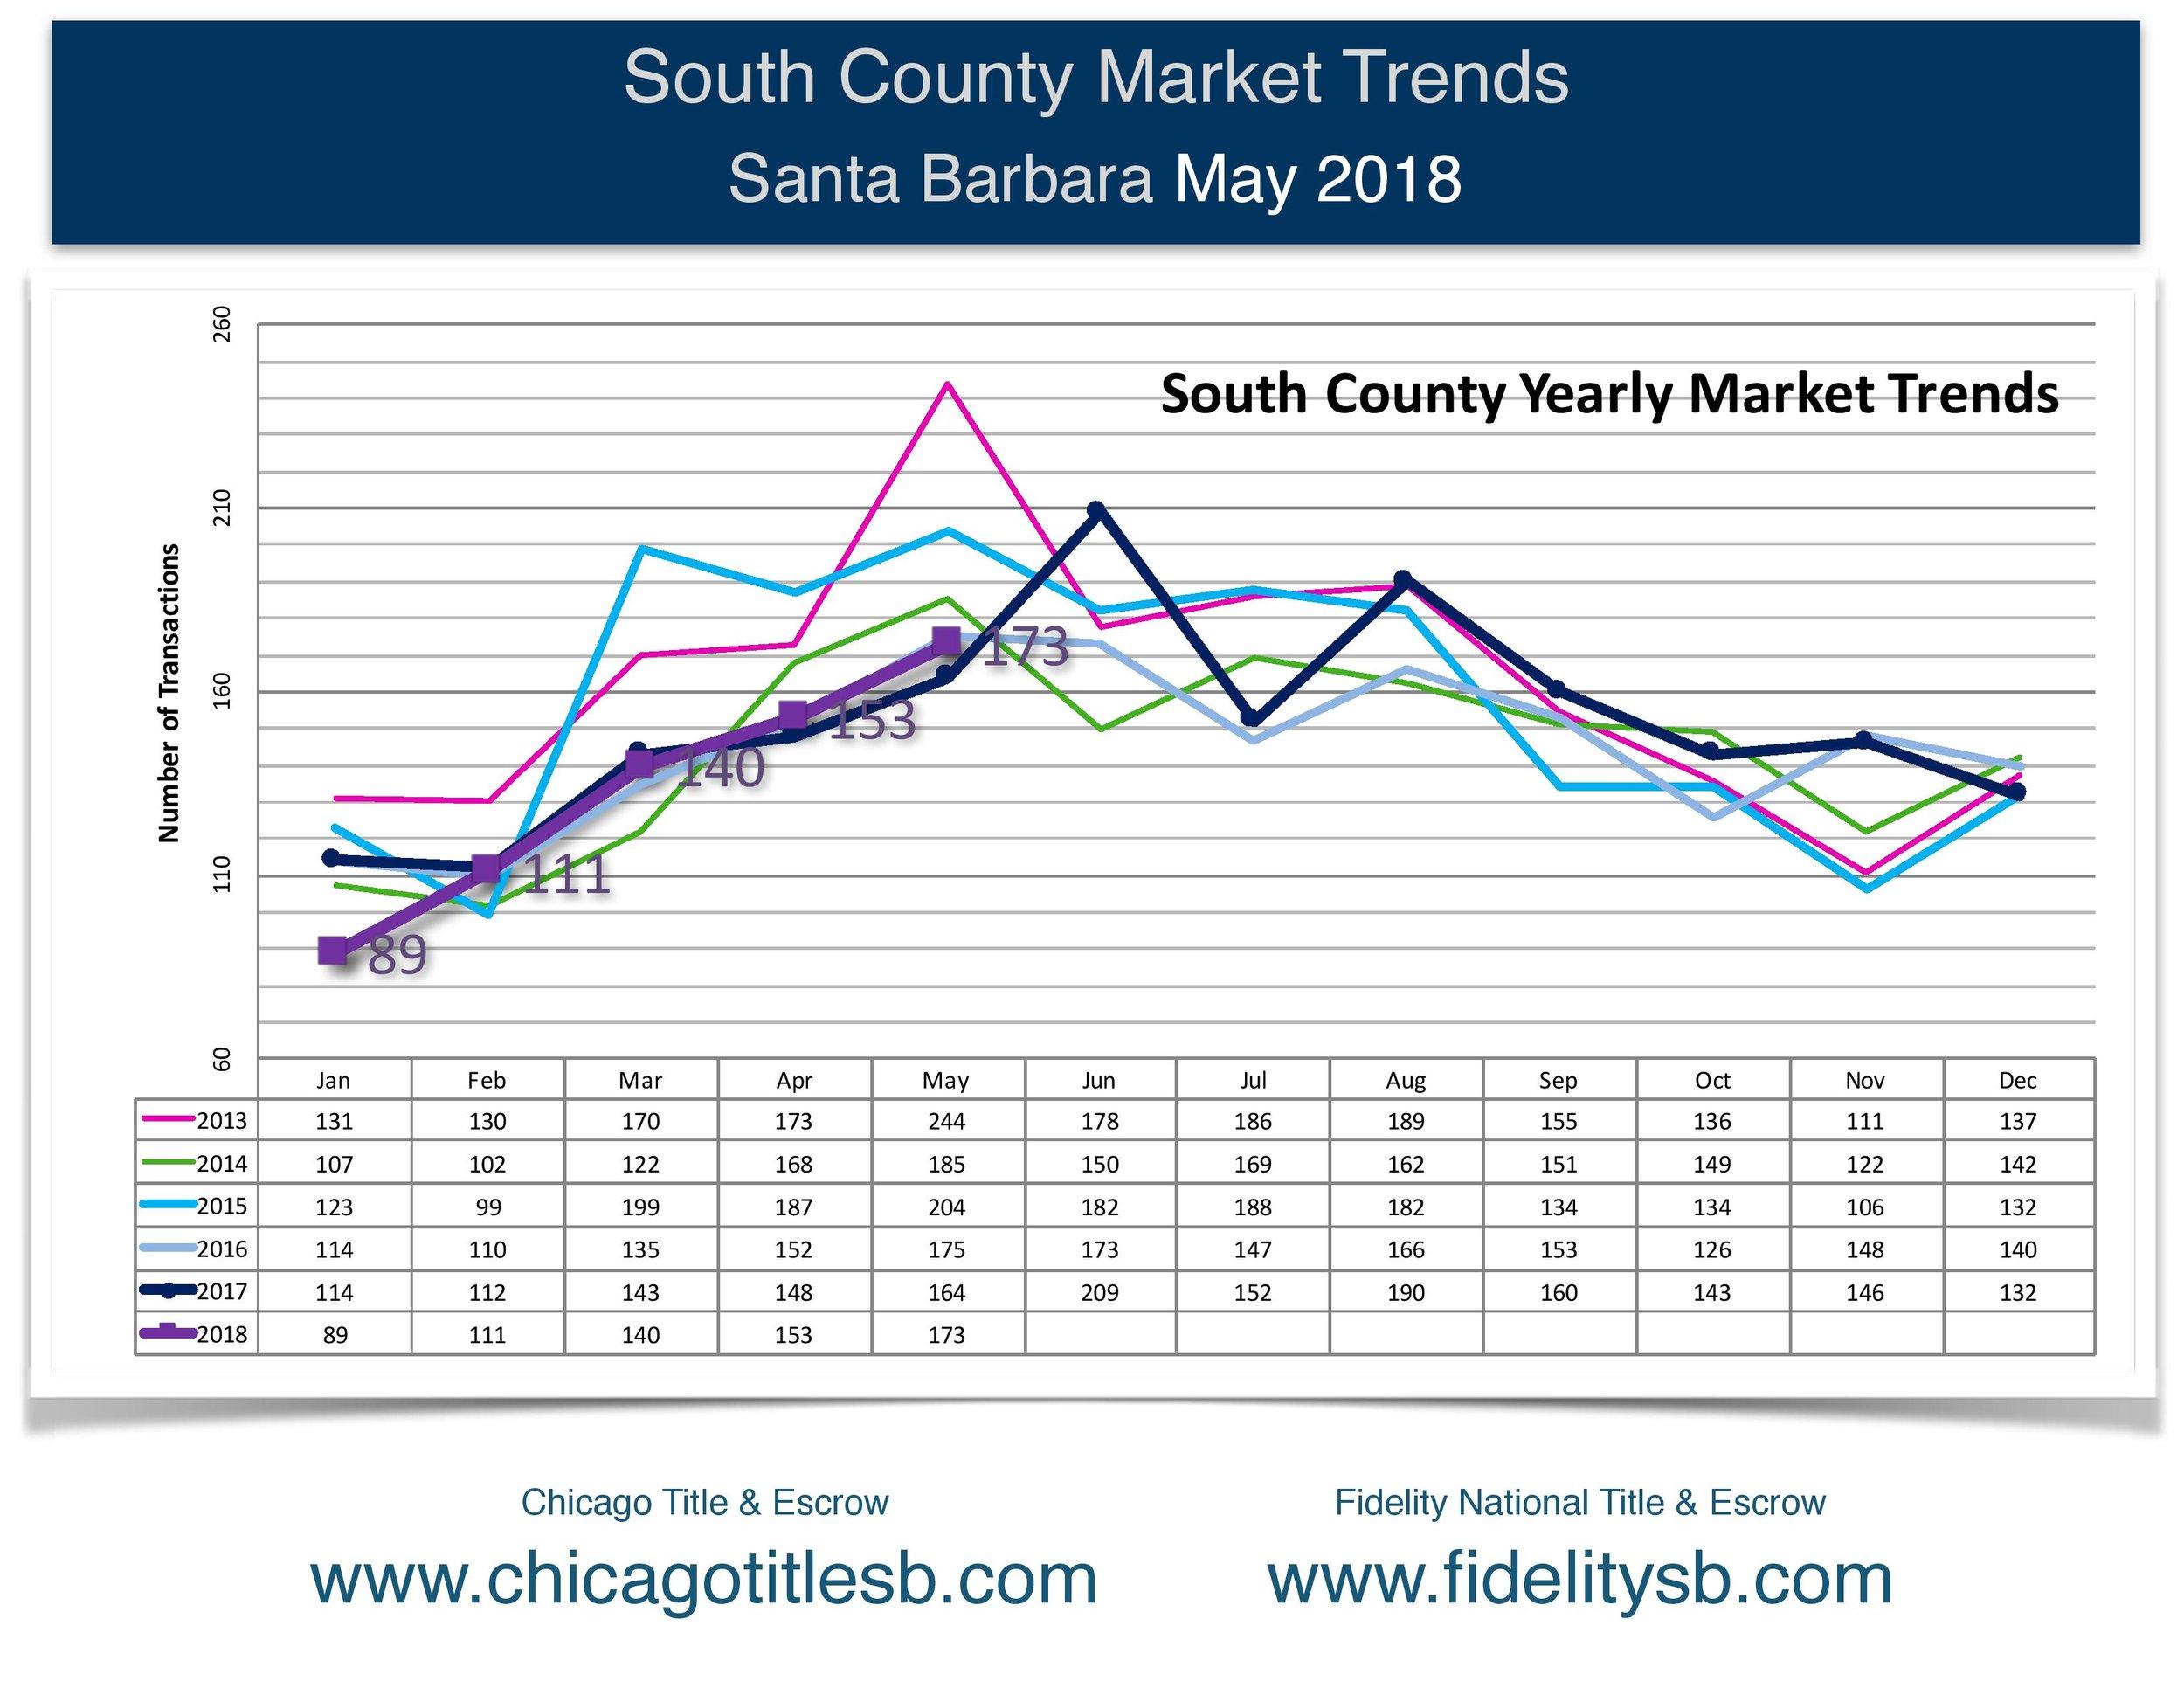 Santa Barbara Market Trends Report, May 2018